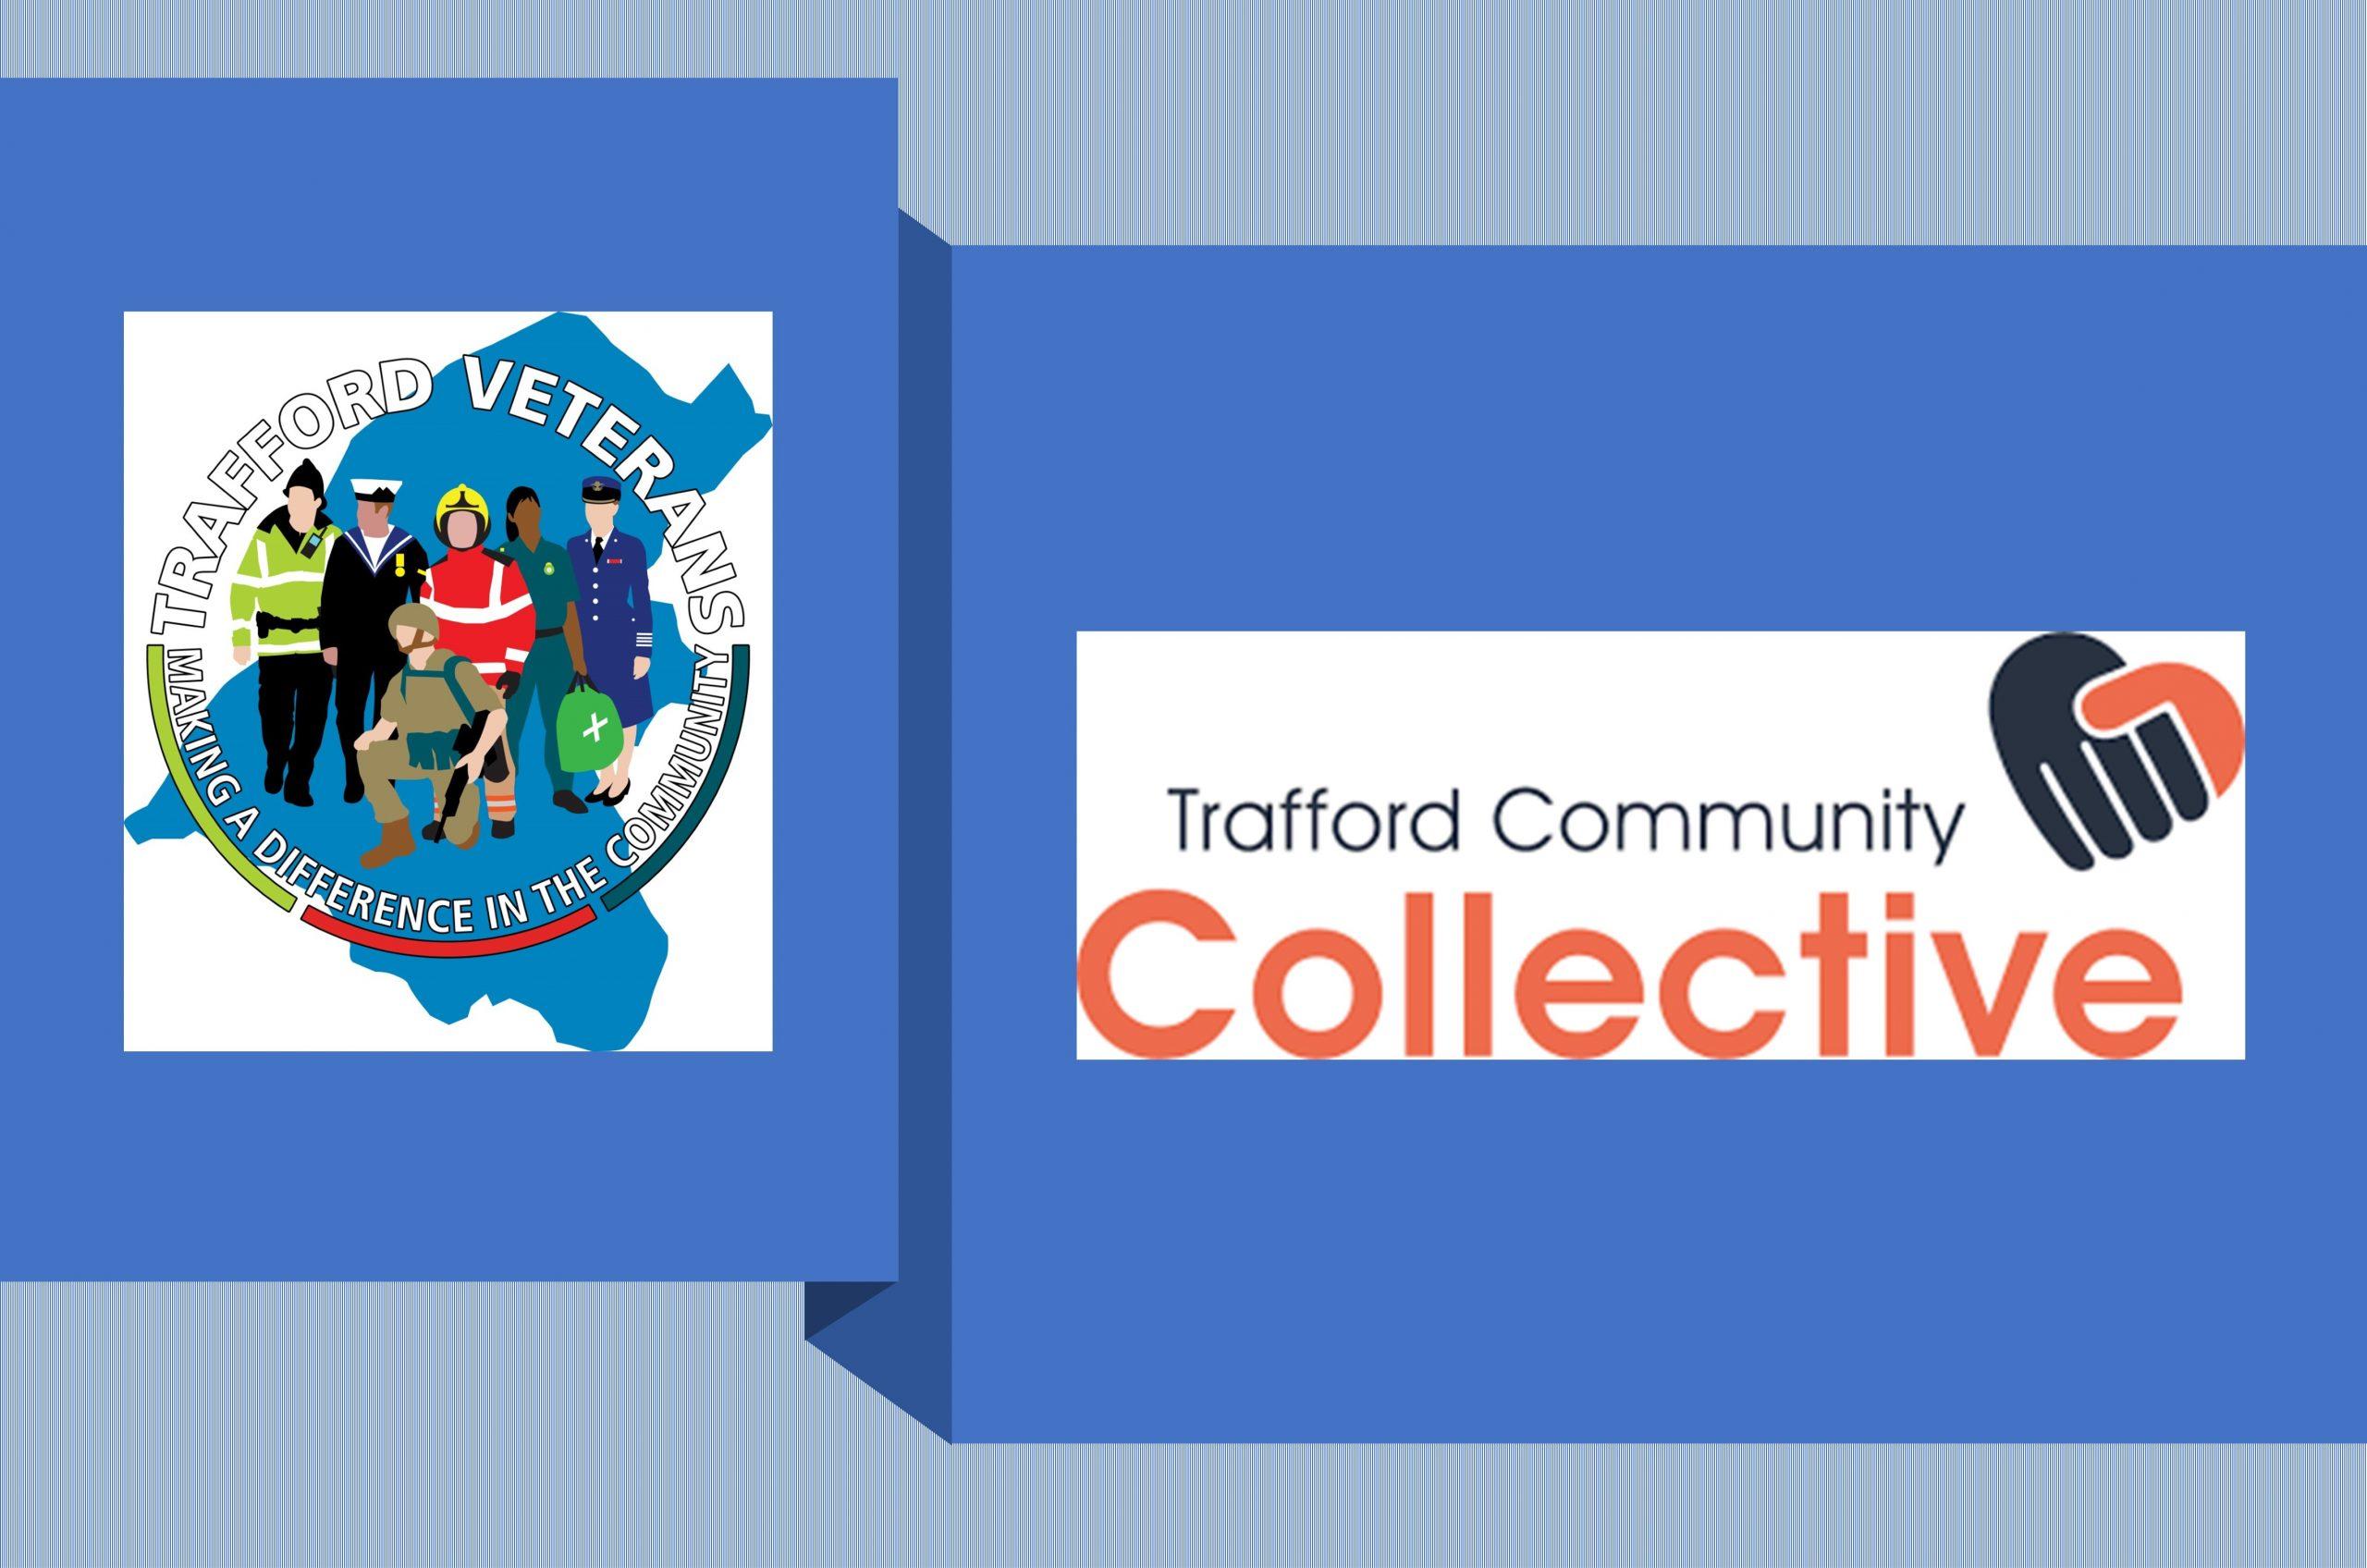 Trafford Community Collective